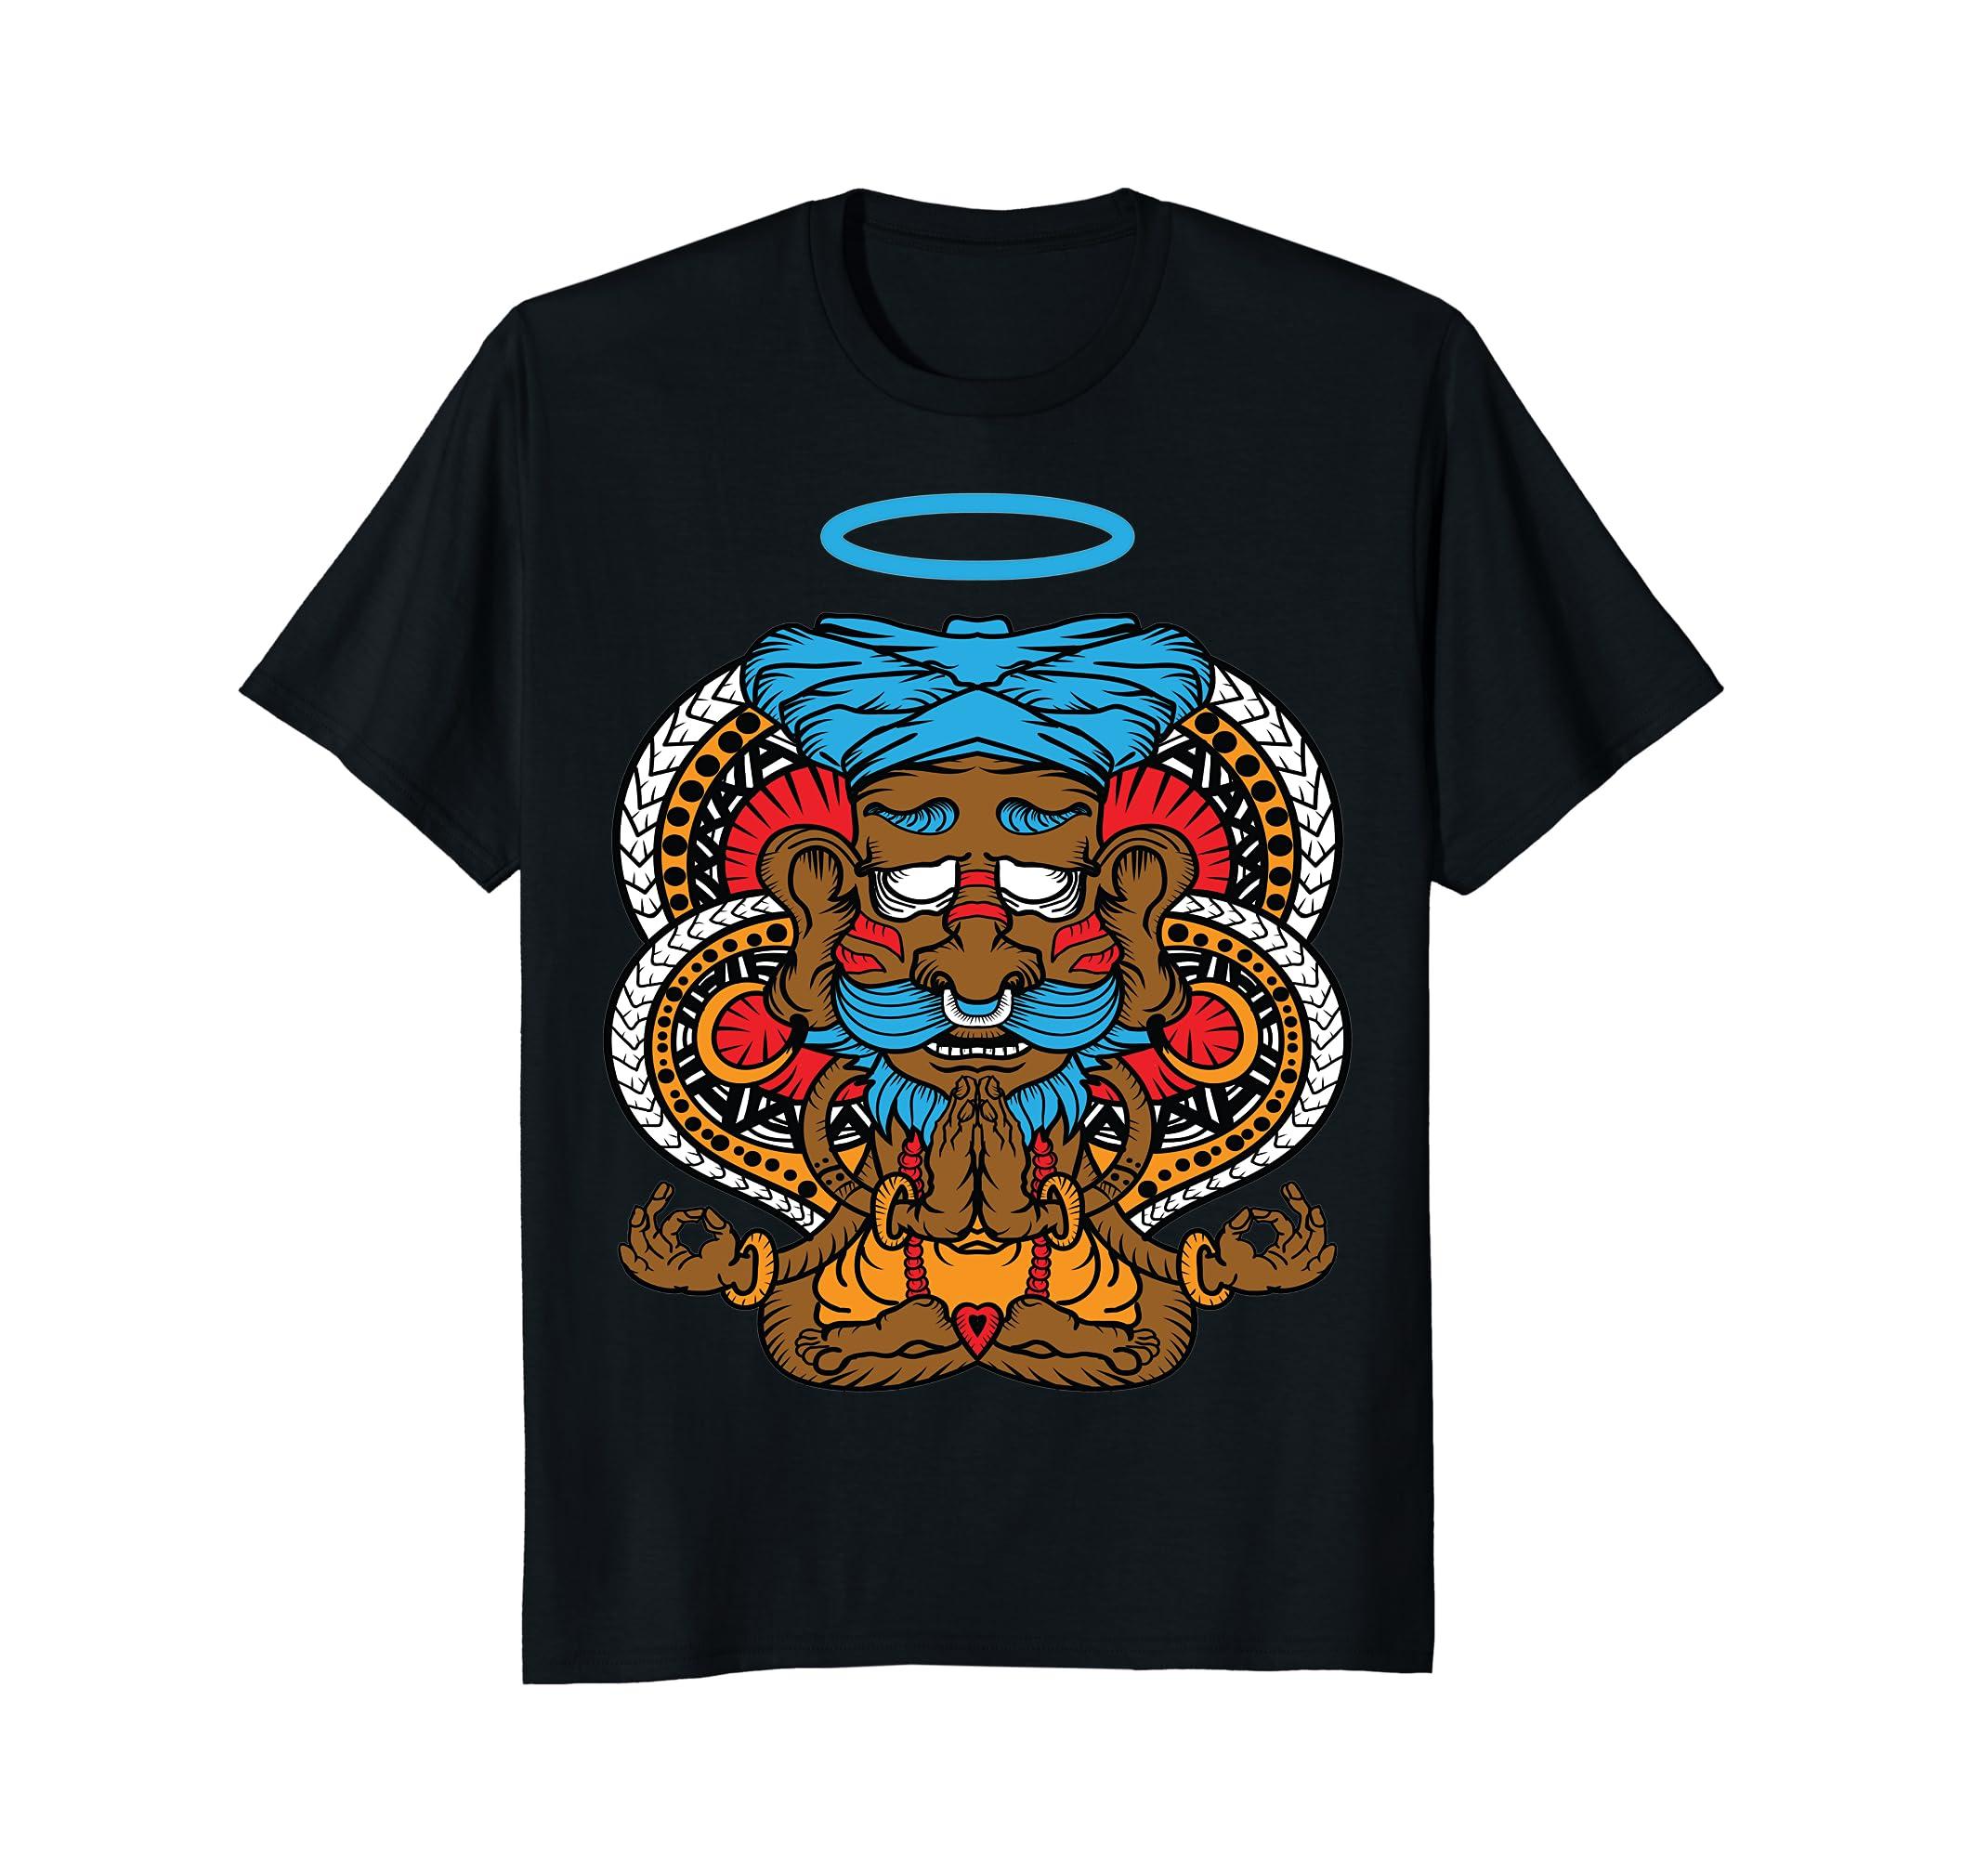 Amazon.com: India Yoga Meditation T-shirts Man Women: Clothing